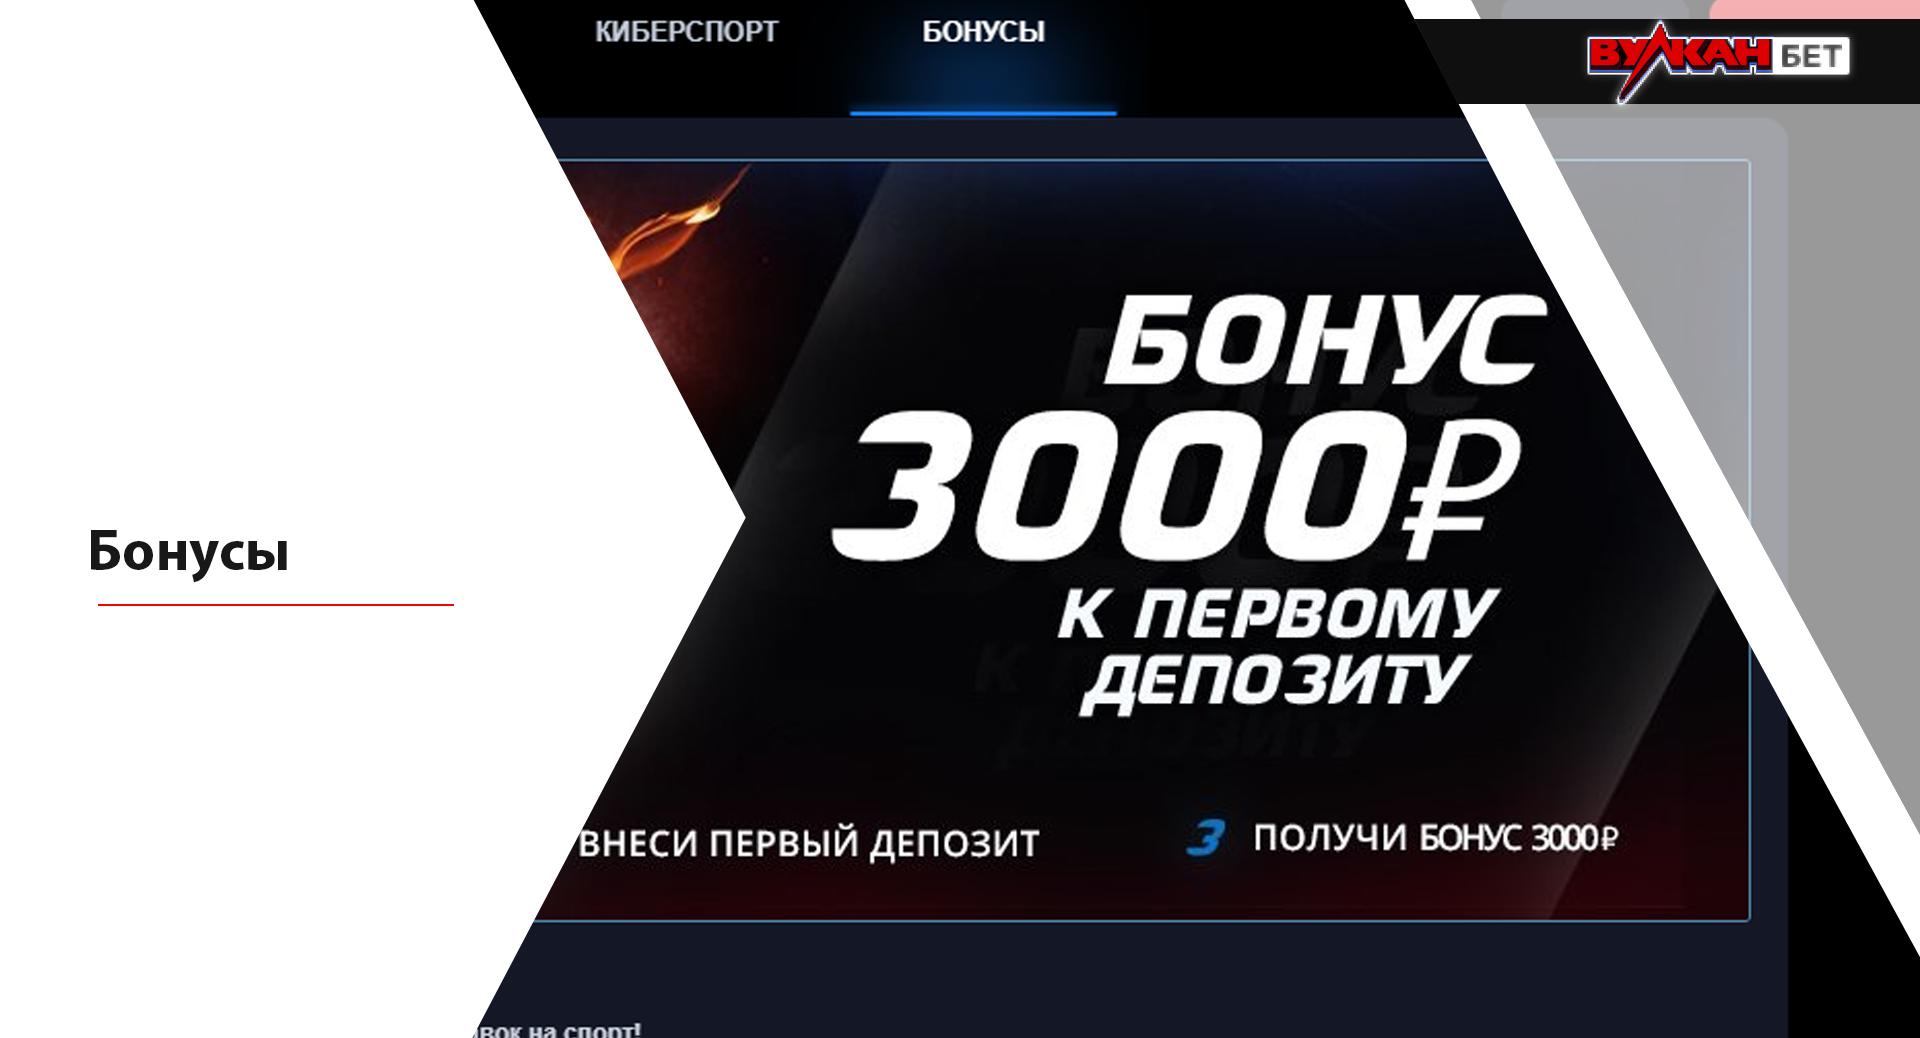 Официальный сайт Vulkanbet бонусы